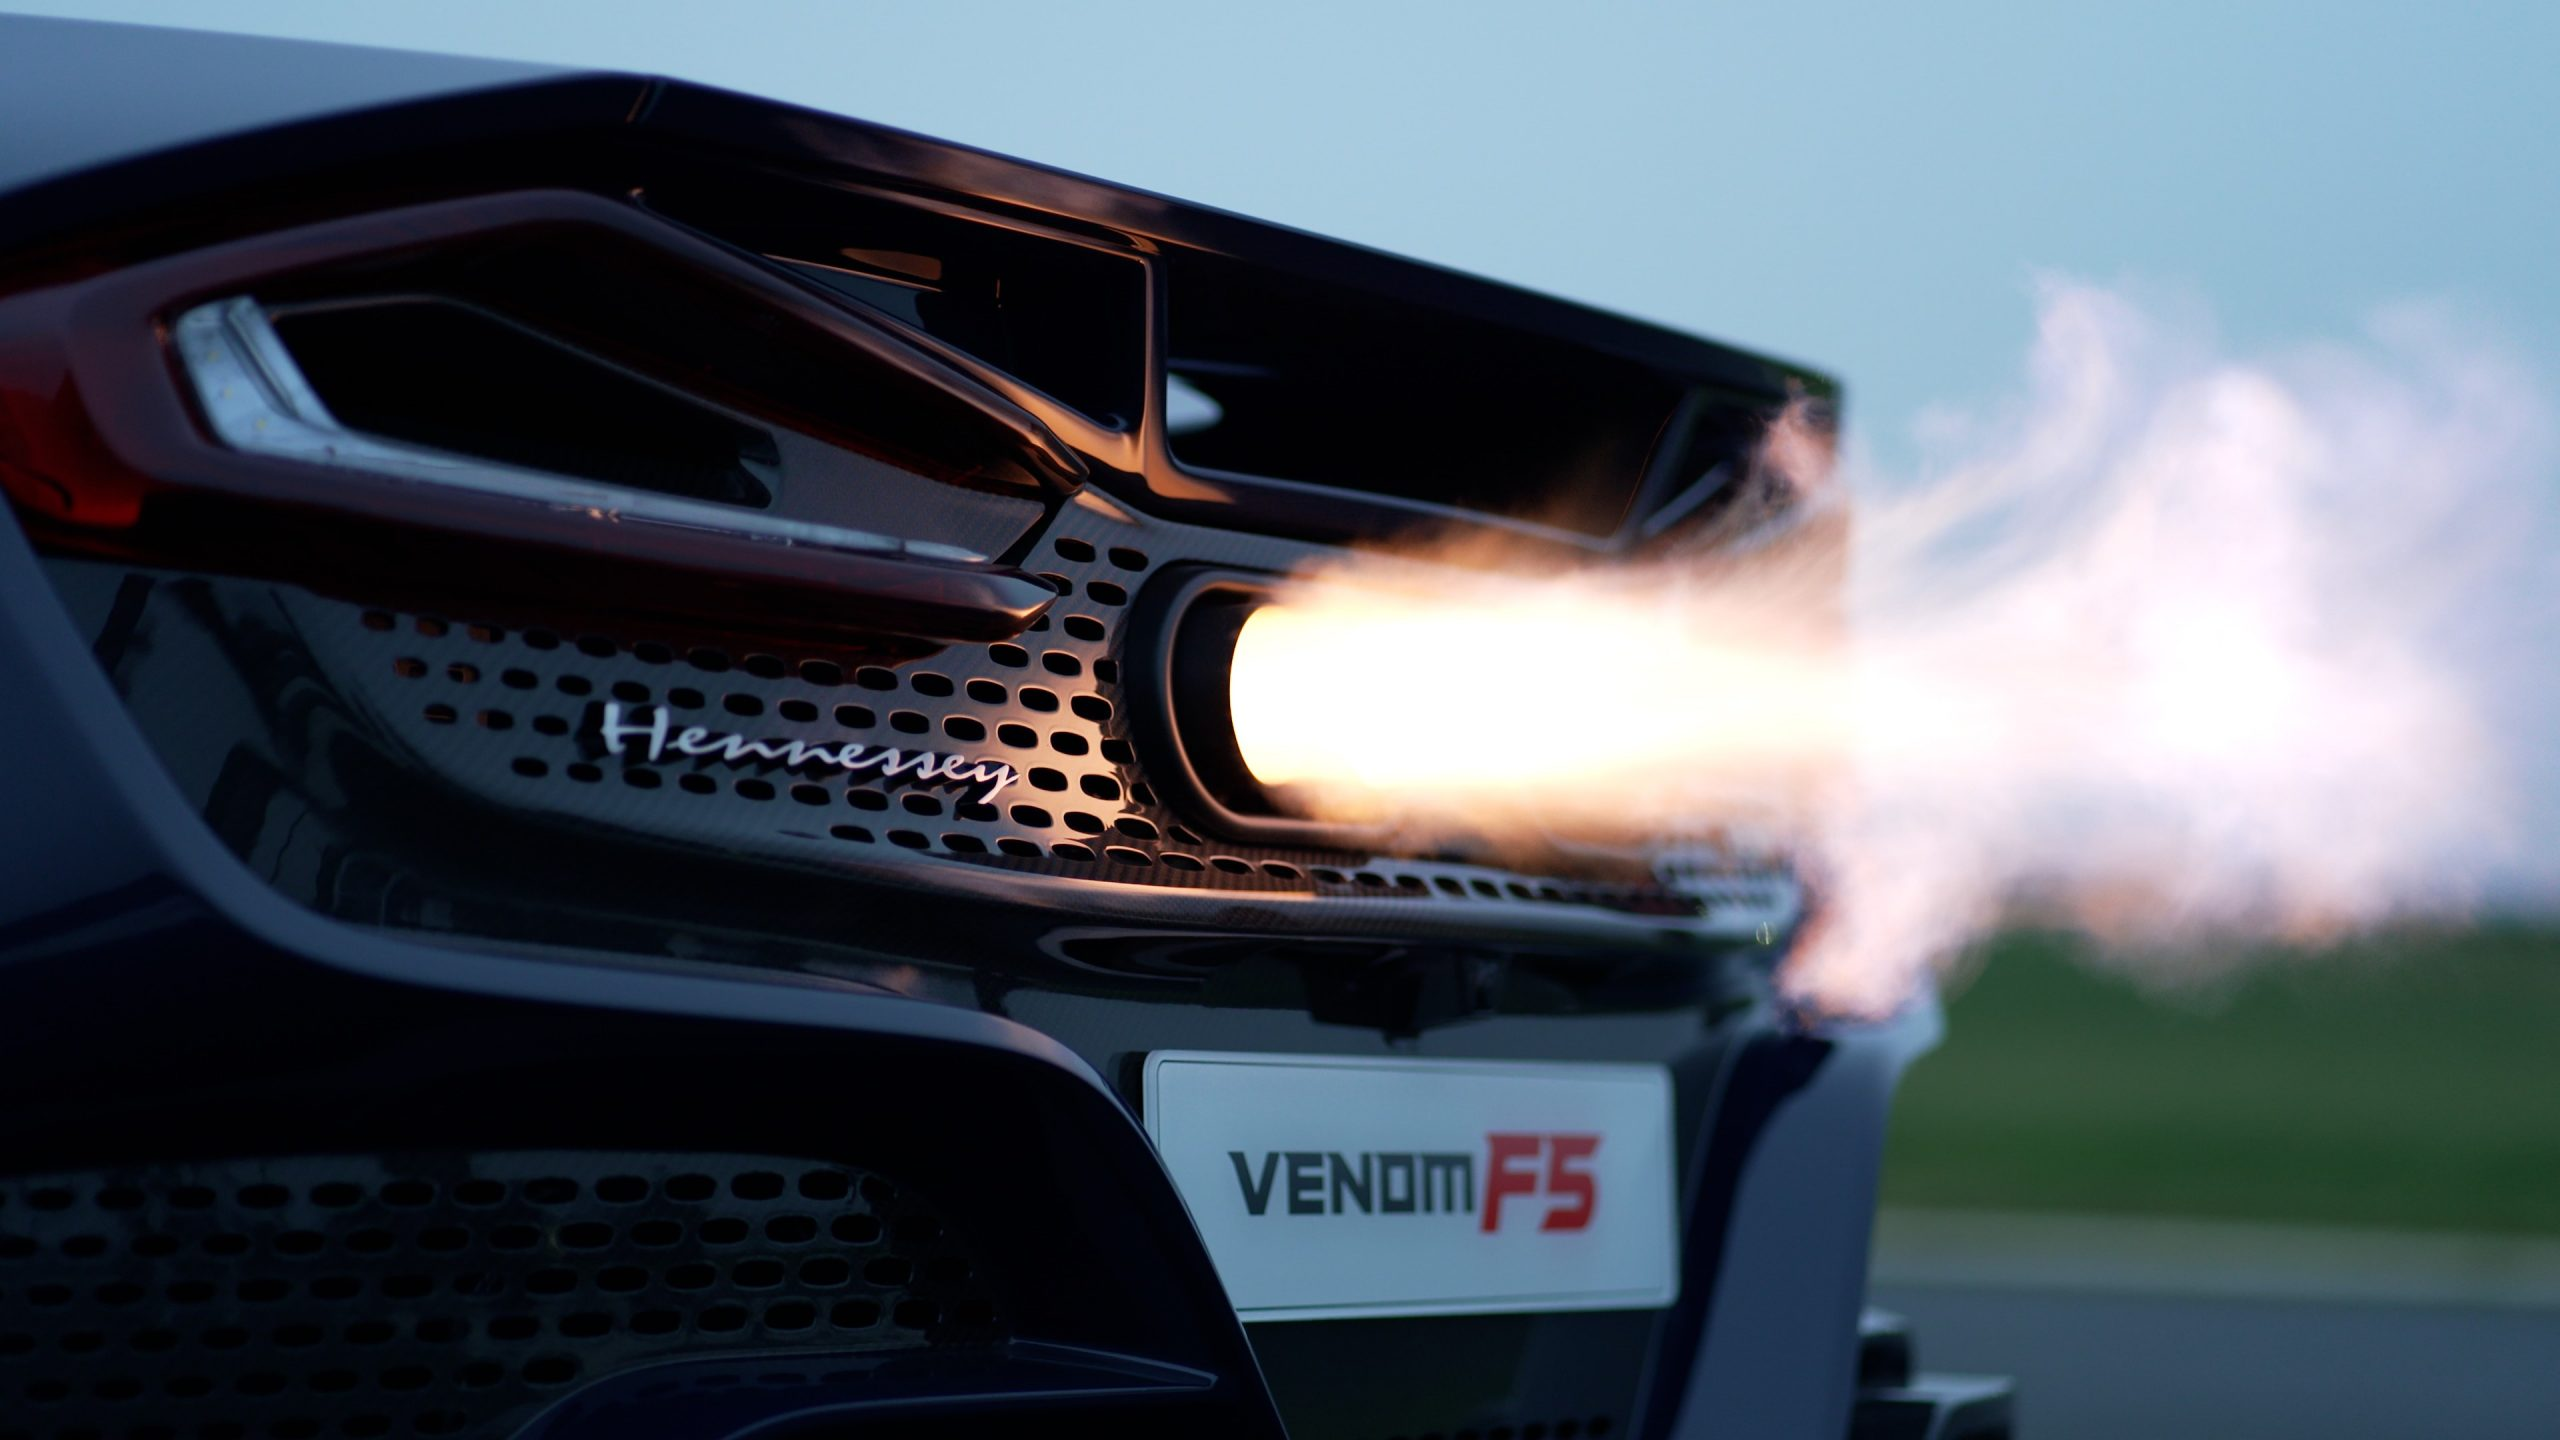 Supercar exhaust flames